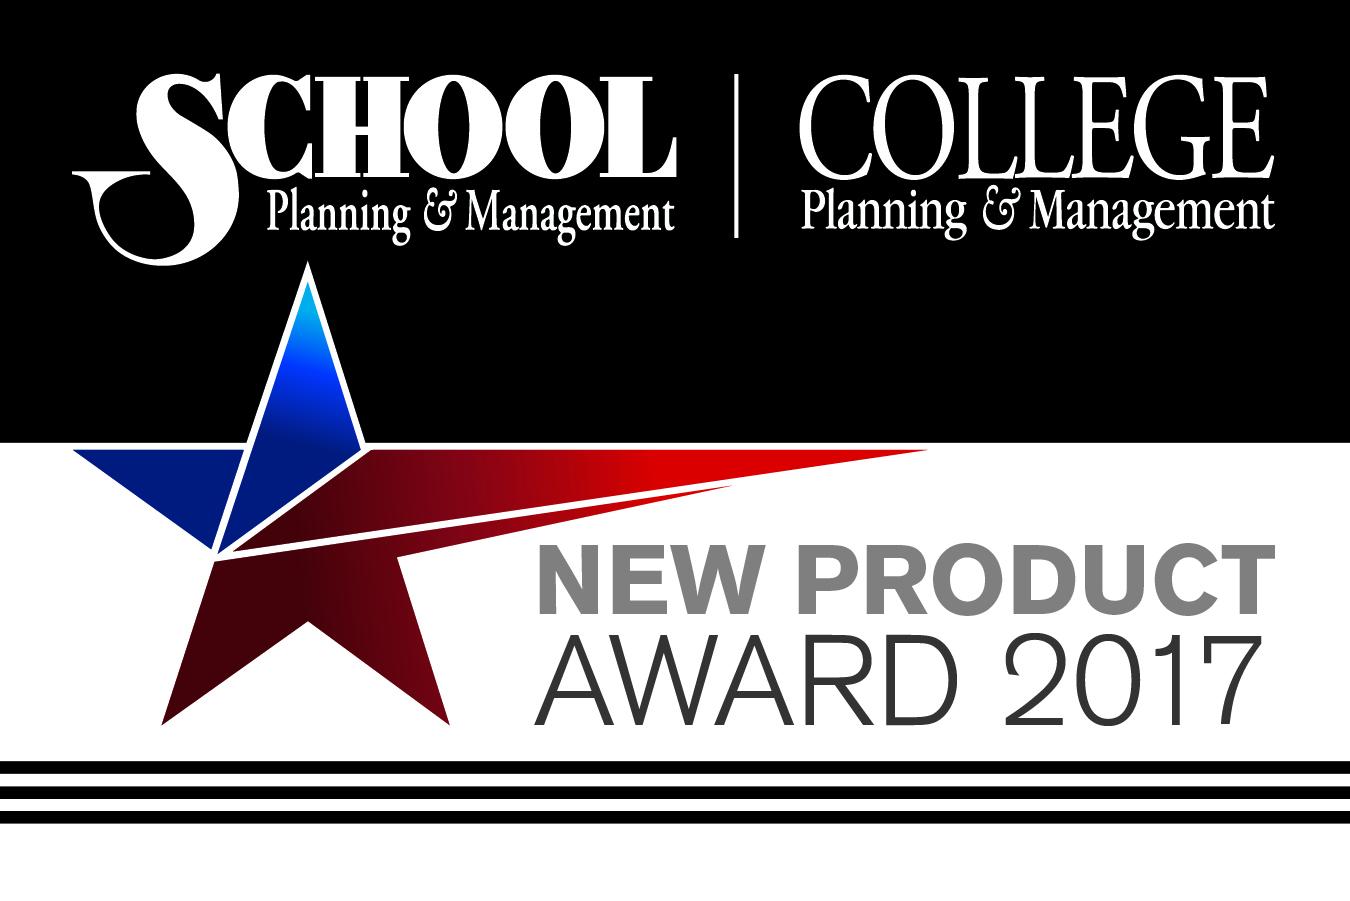 SPM_CPM_NPOY_Award_logo_2017.jpg